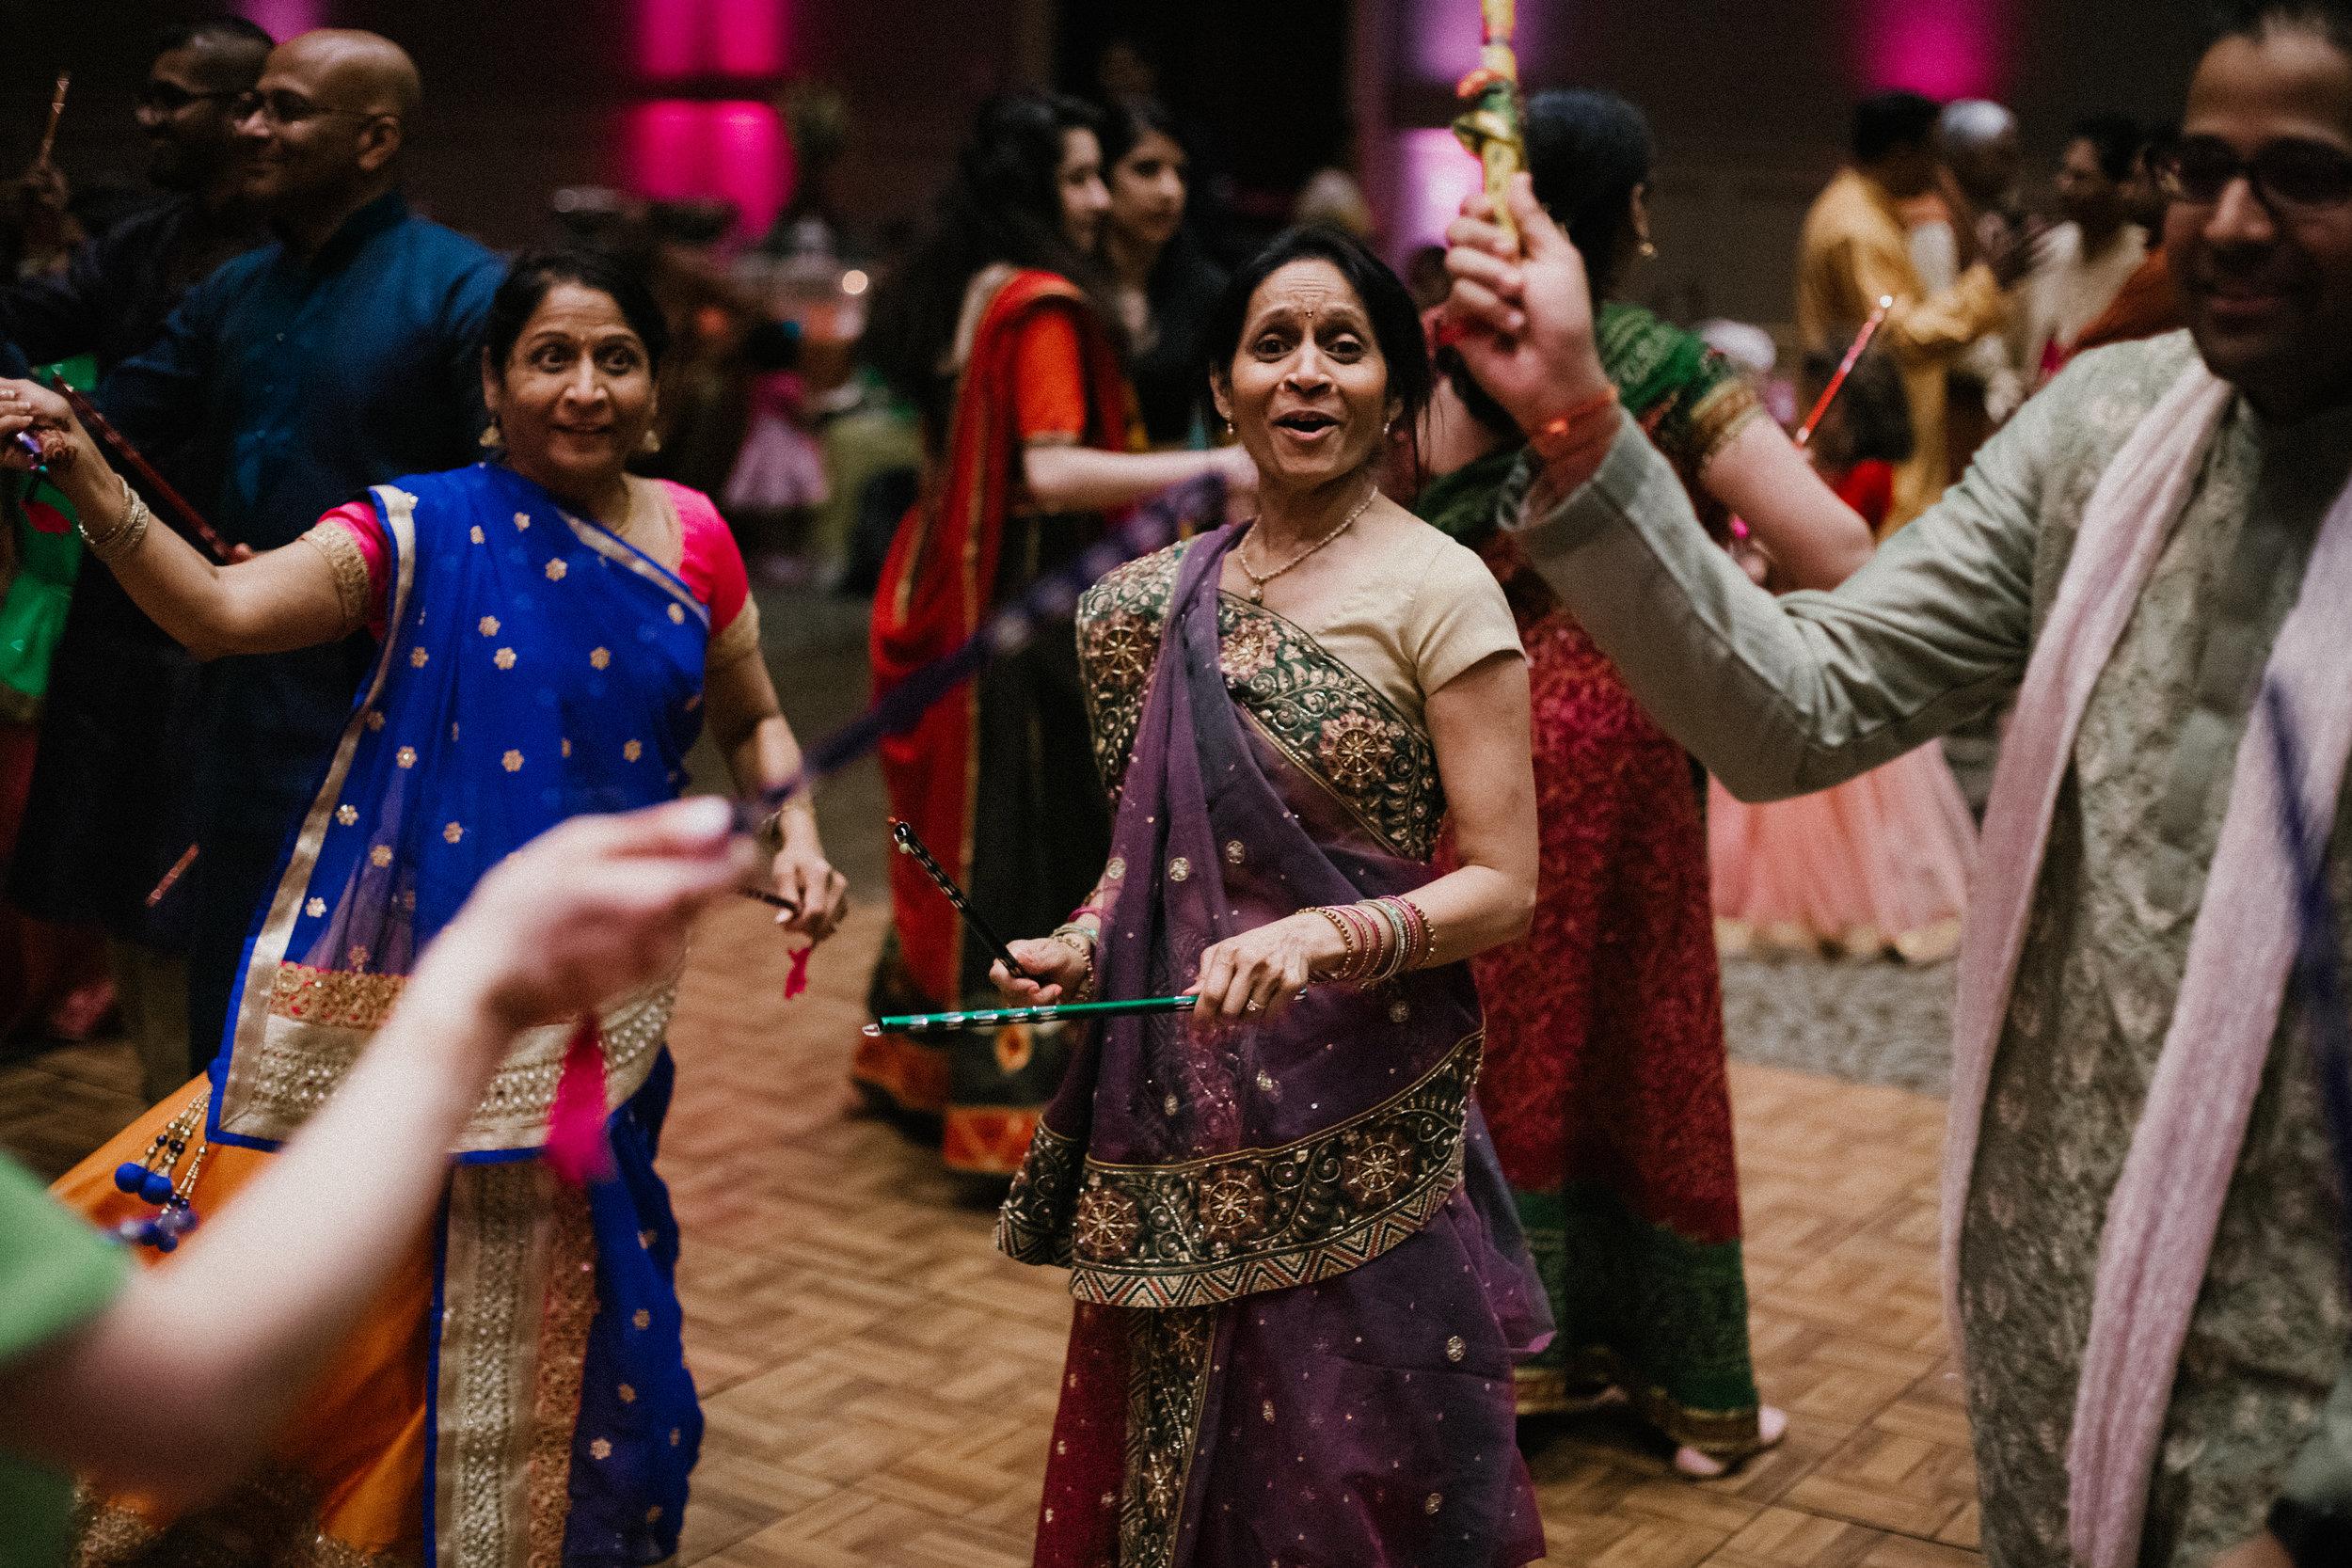 Aparna-Ankit-Patel-Shah-Detroit-Michigan-Shadow-Shine-Pictures-Photography-Indian-Mid-West-Garba-Raas